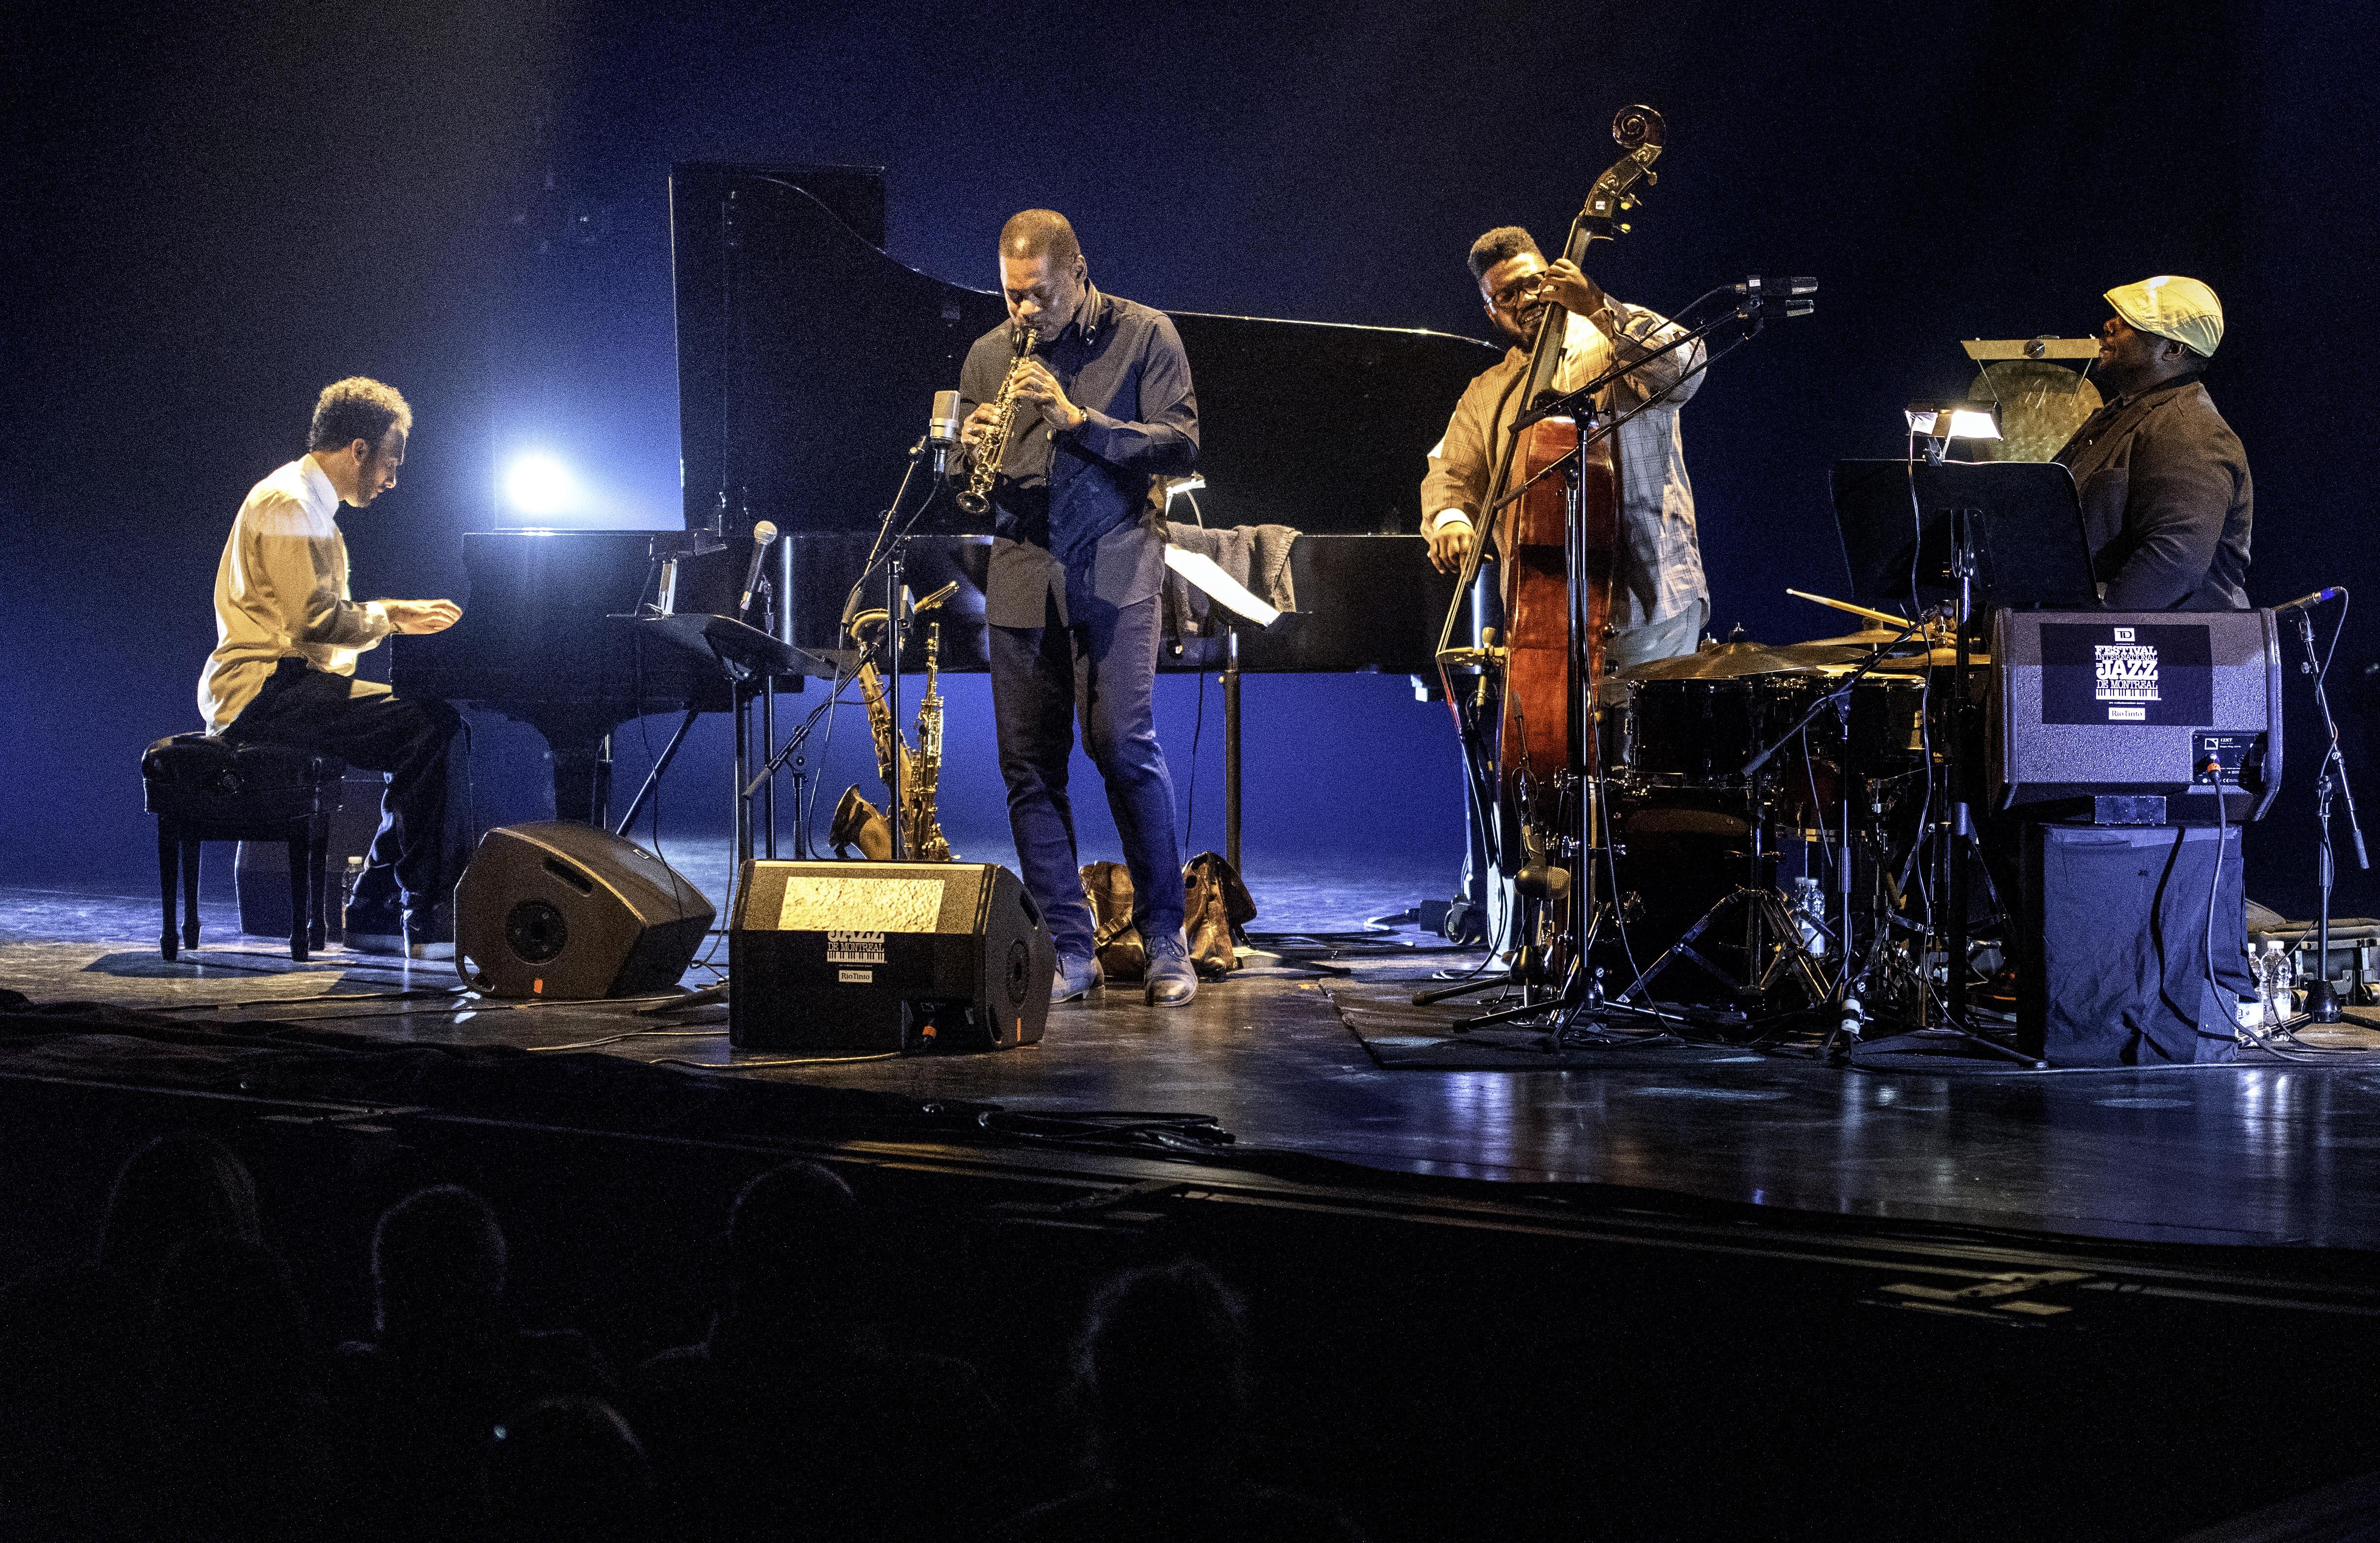 David Virelles, Ravi Coltrane, Dezron Douglas and Johnathan Blake At The Montreal International Jazz Festival 2019